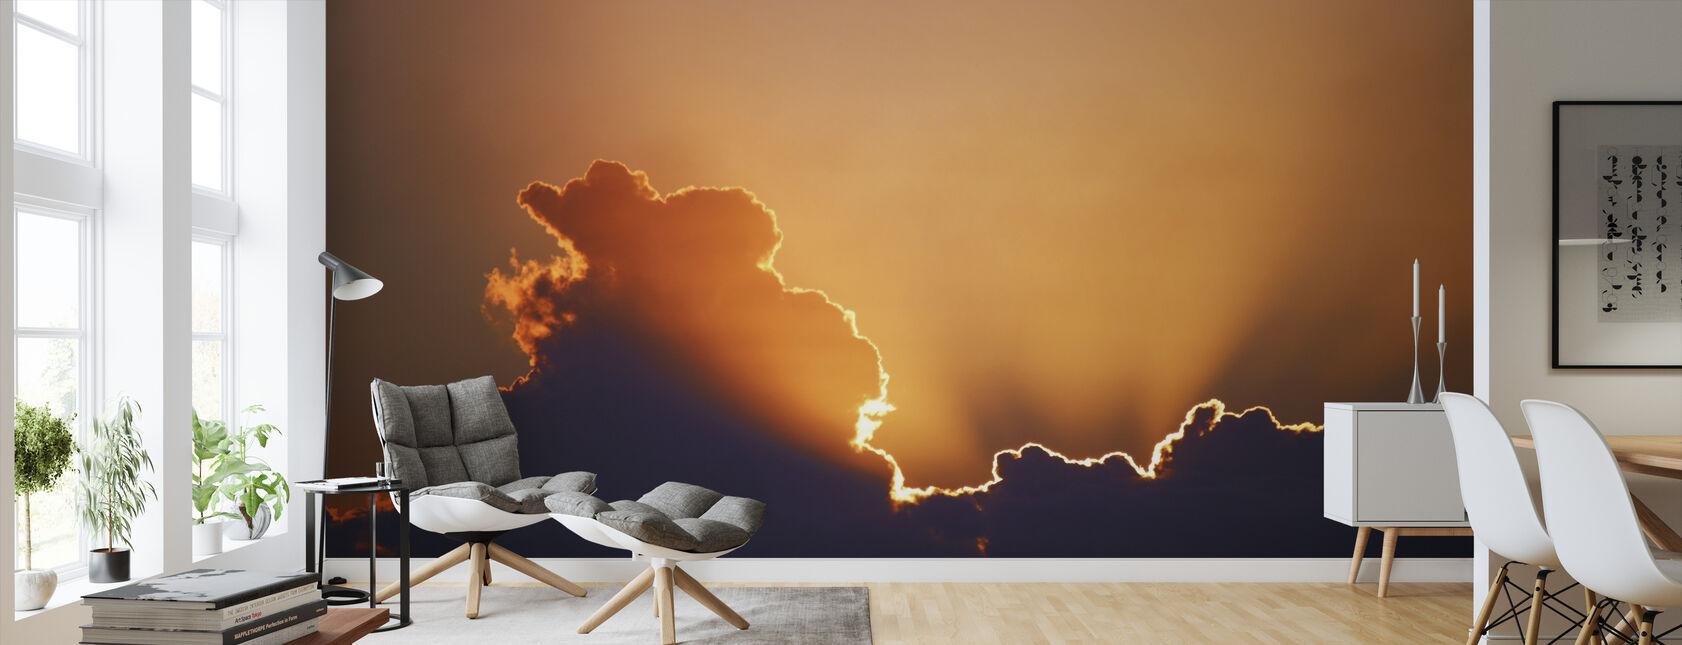 Golden Sky - Wallpaper - Living Room